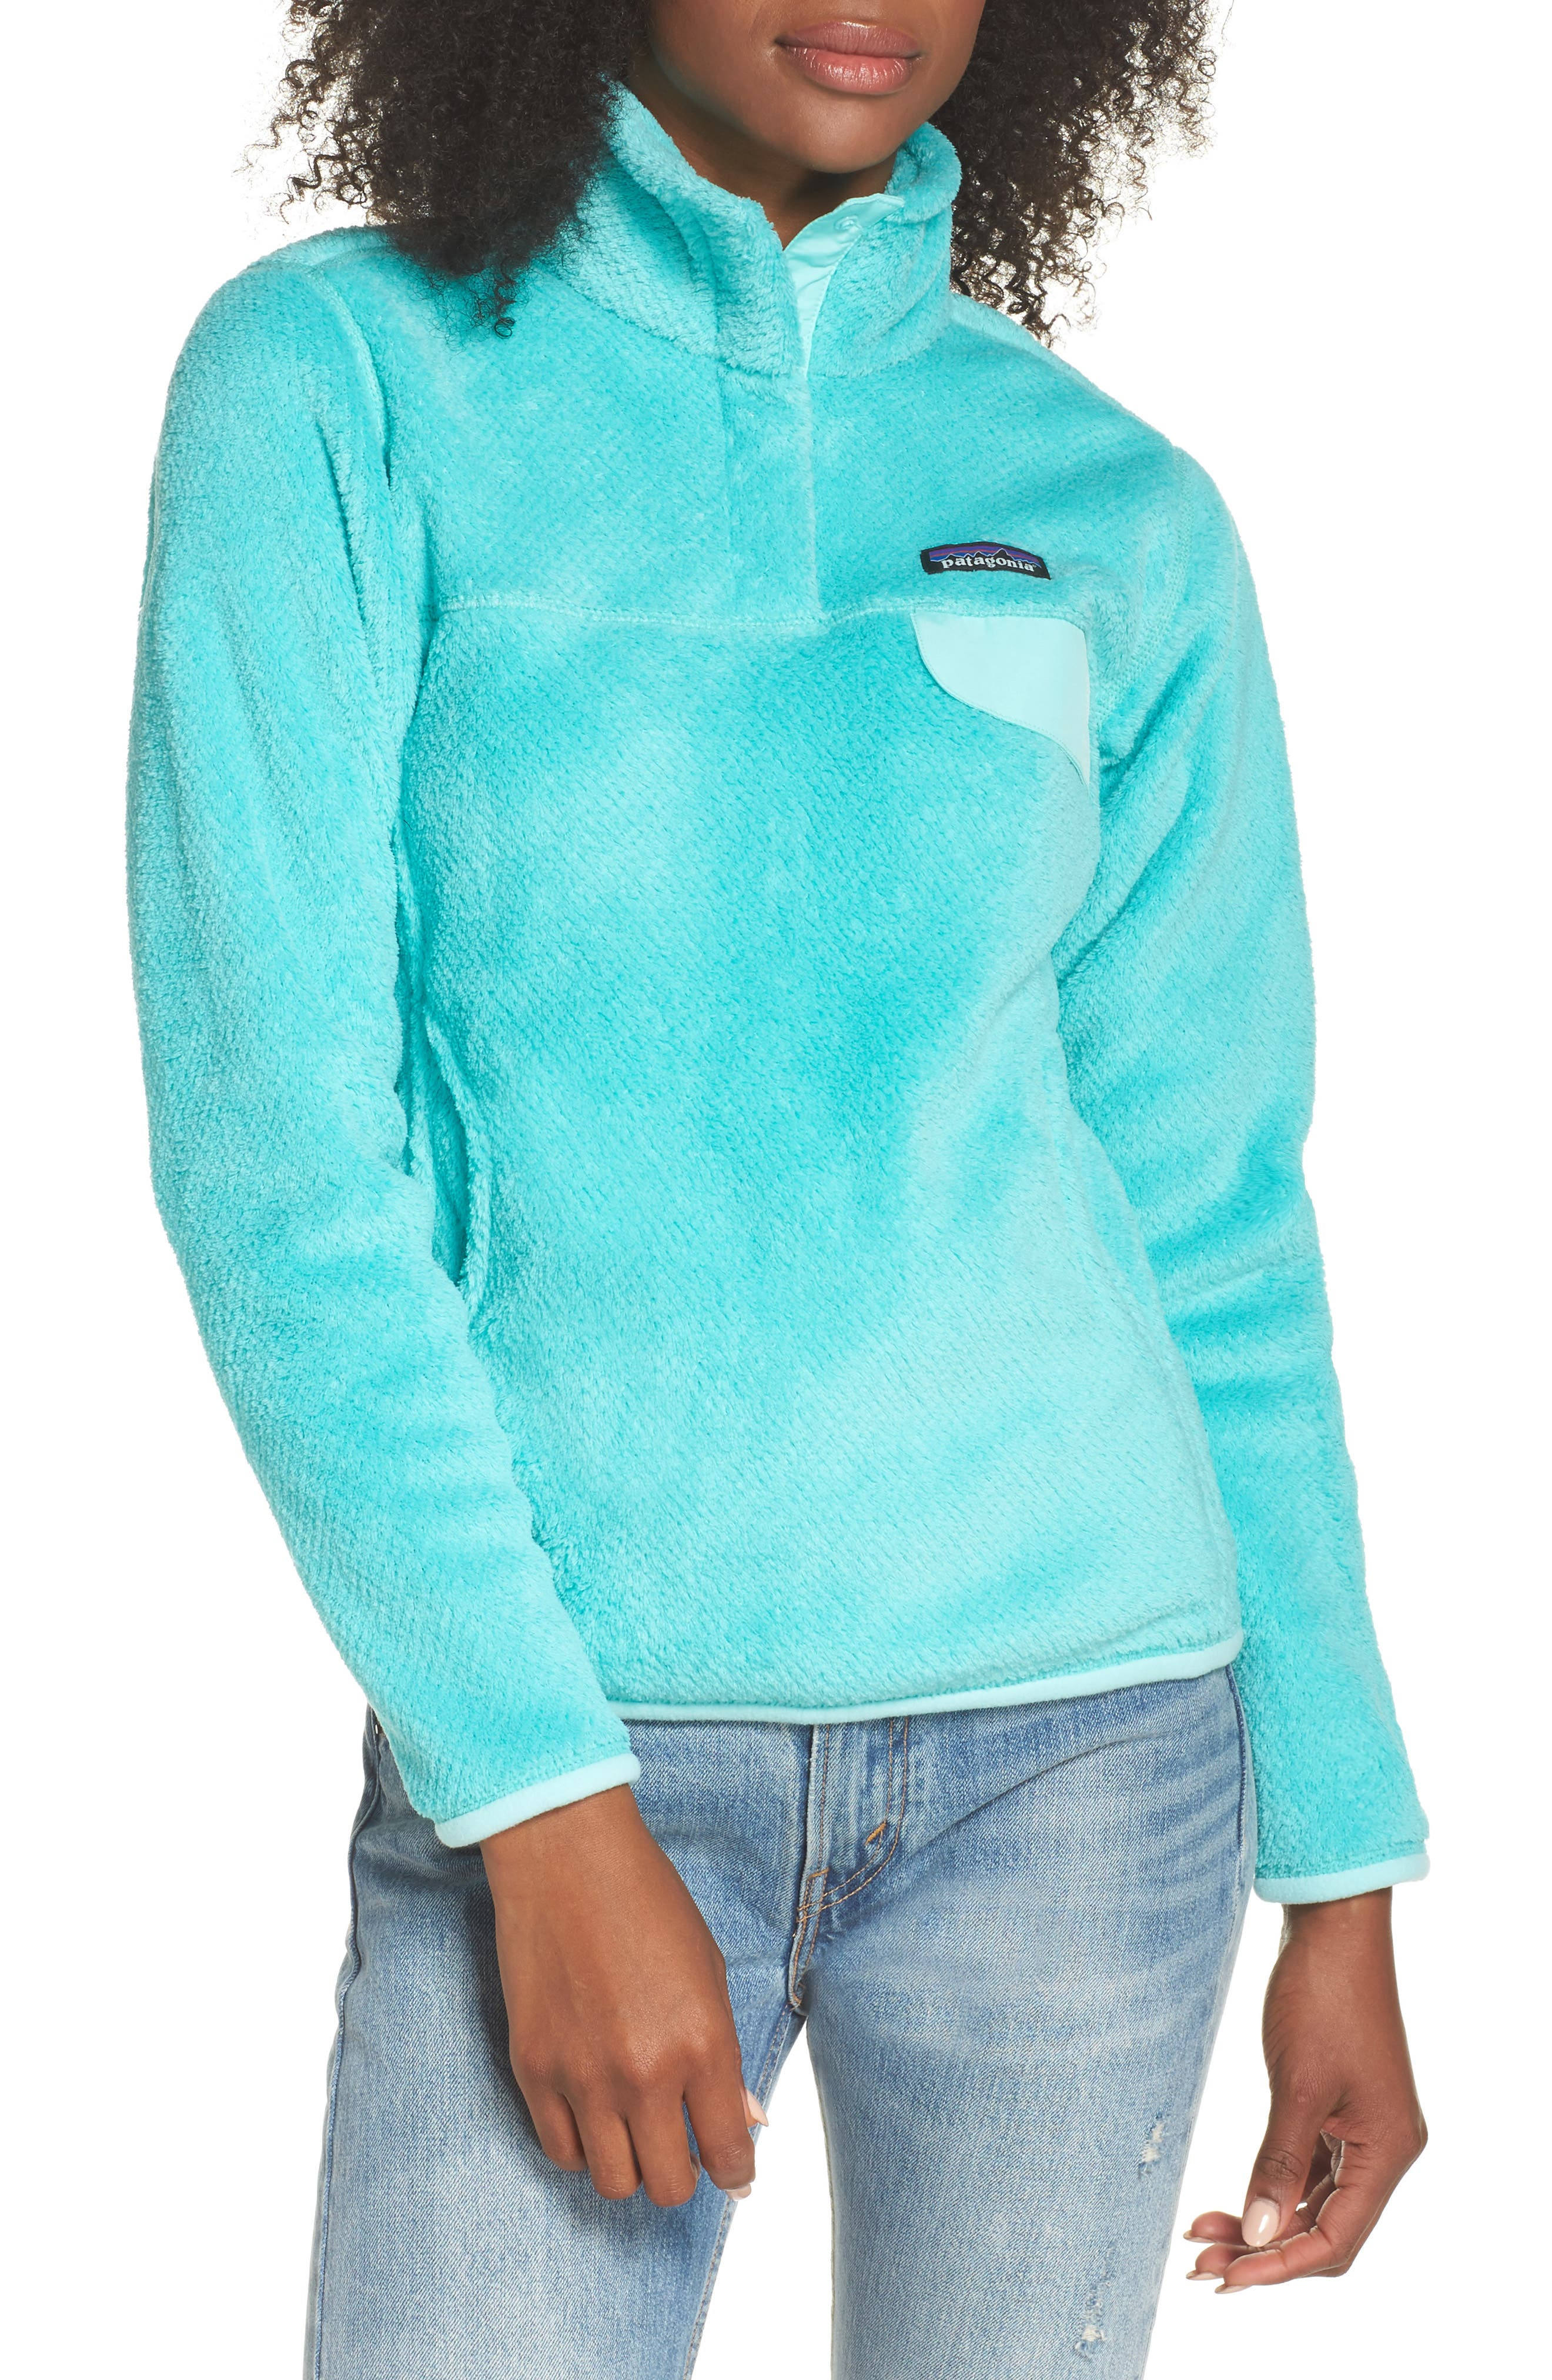 Re-Tool Snap-T<sup>®</sup> Fleece Pullover,                             Main thumbnail 1, color,                             Bend Blue/ Strait Blue X Dye